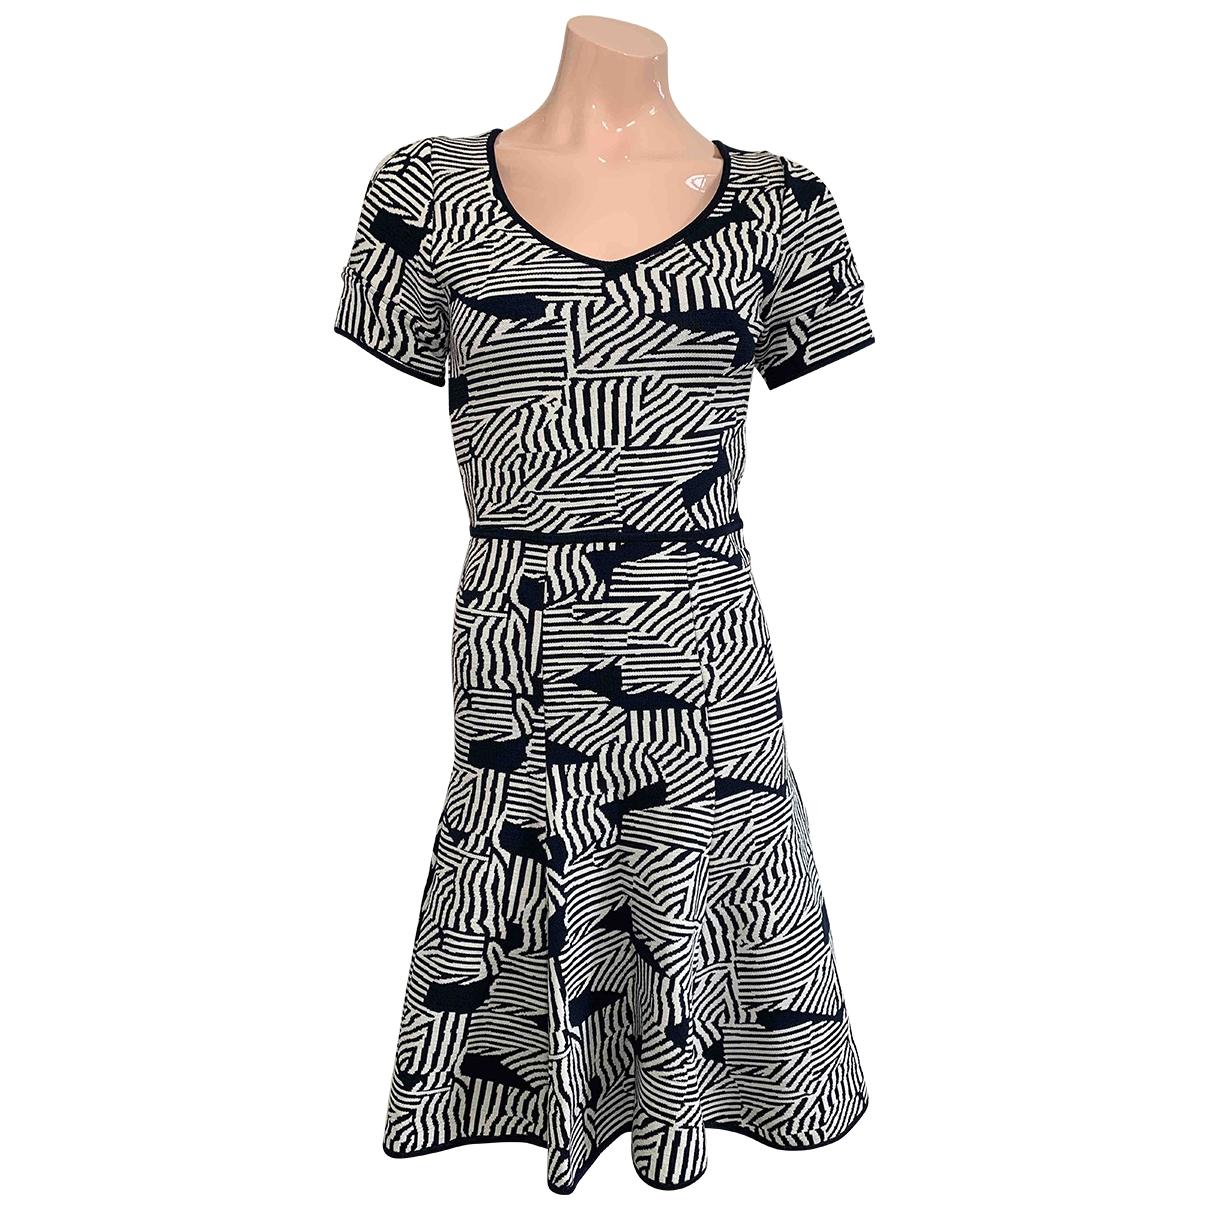 Zac Posen \N Blue dress for Women XL International